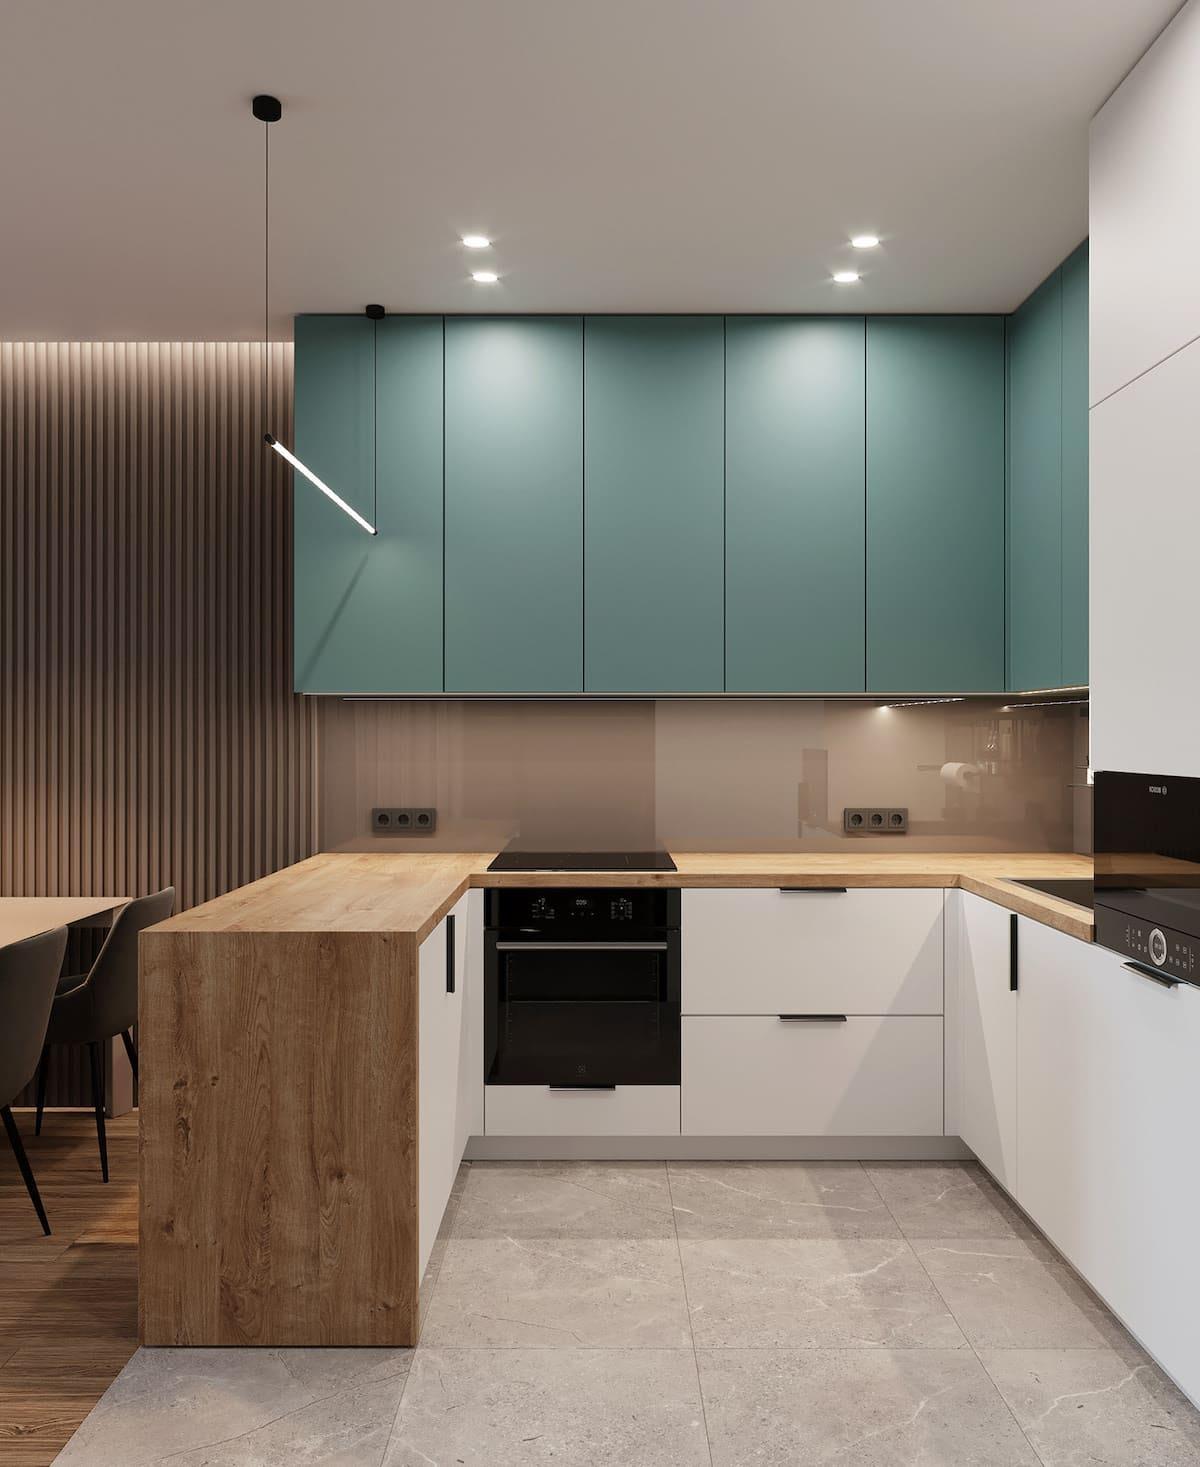 модный дизайн интерьера квартиры фото 101